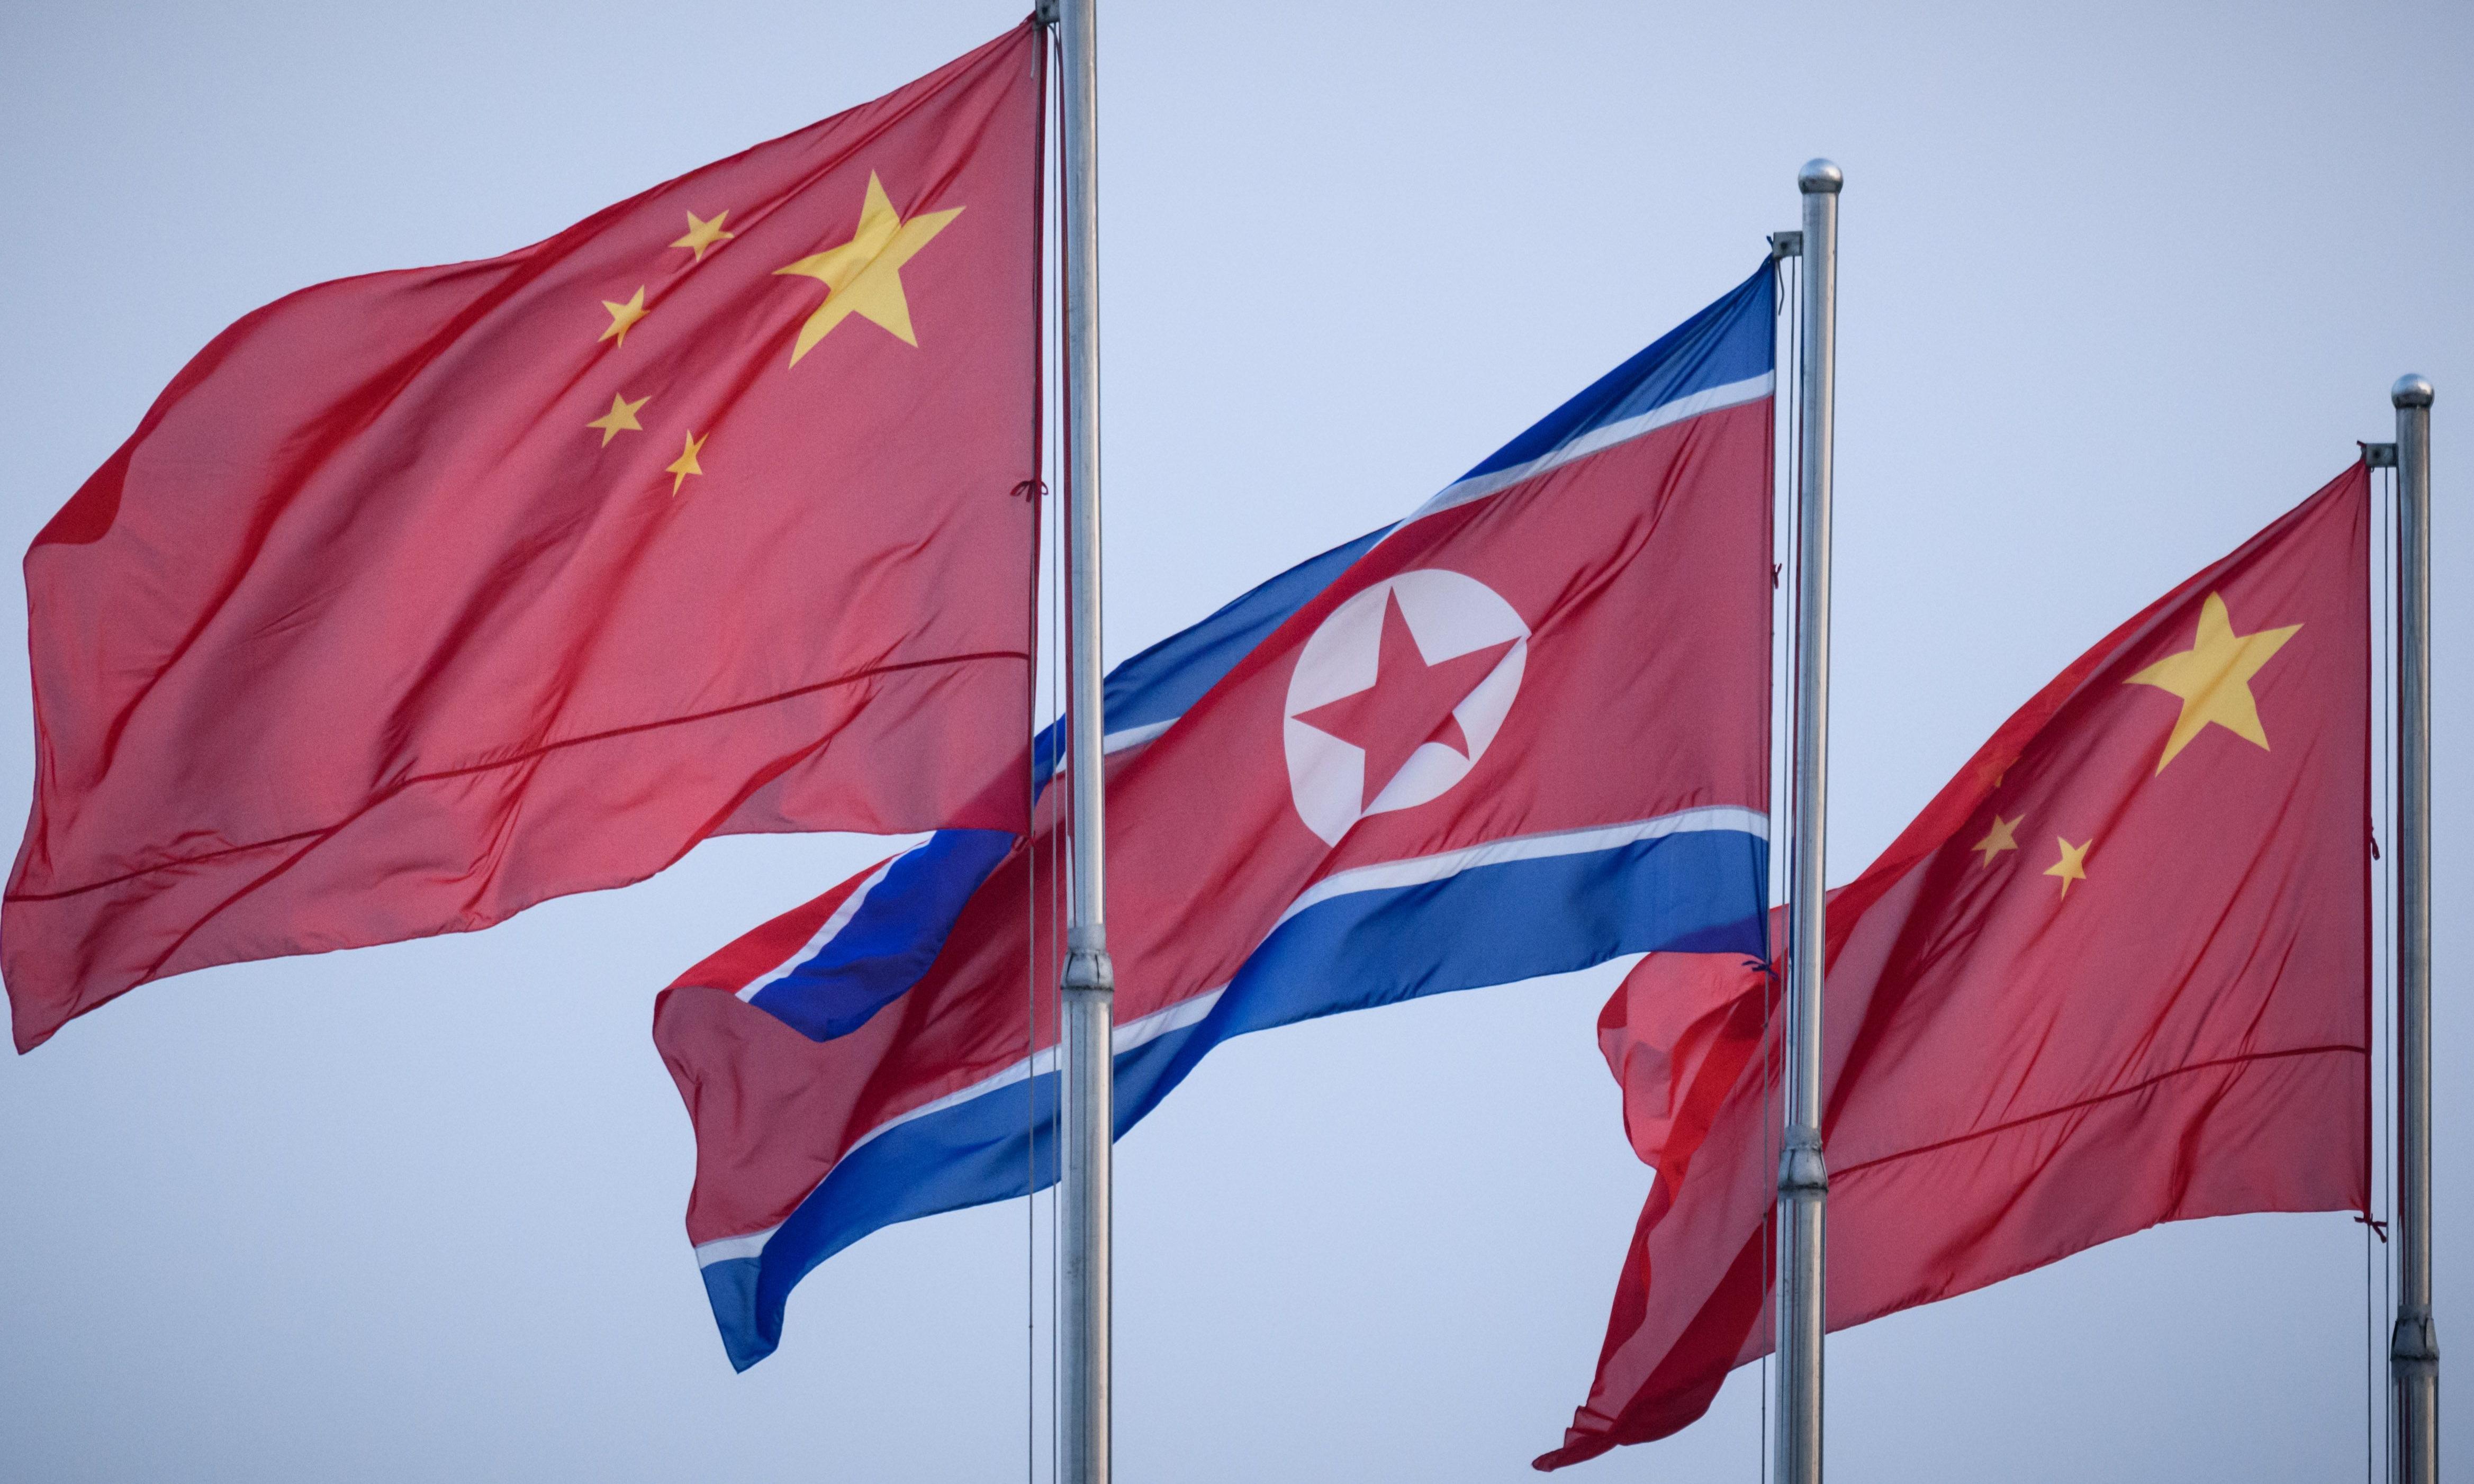 Xi Jinping lands in North Korea to meet Kim ahead of Trump talks